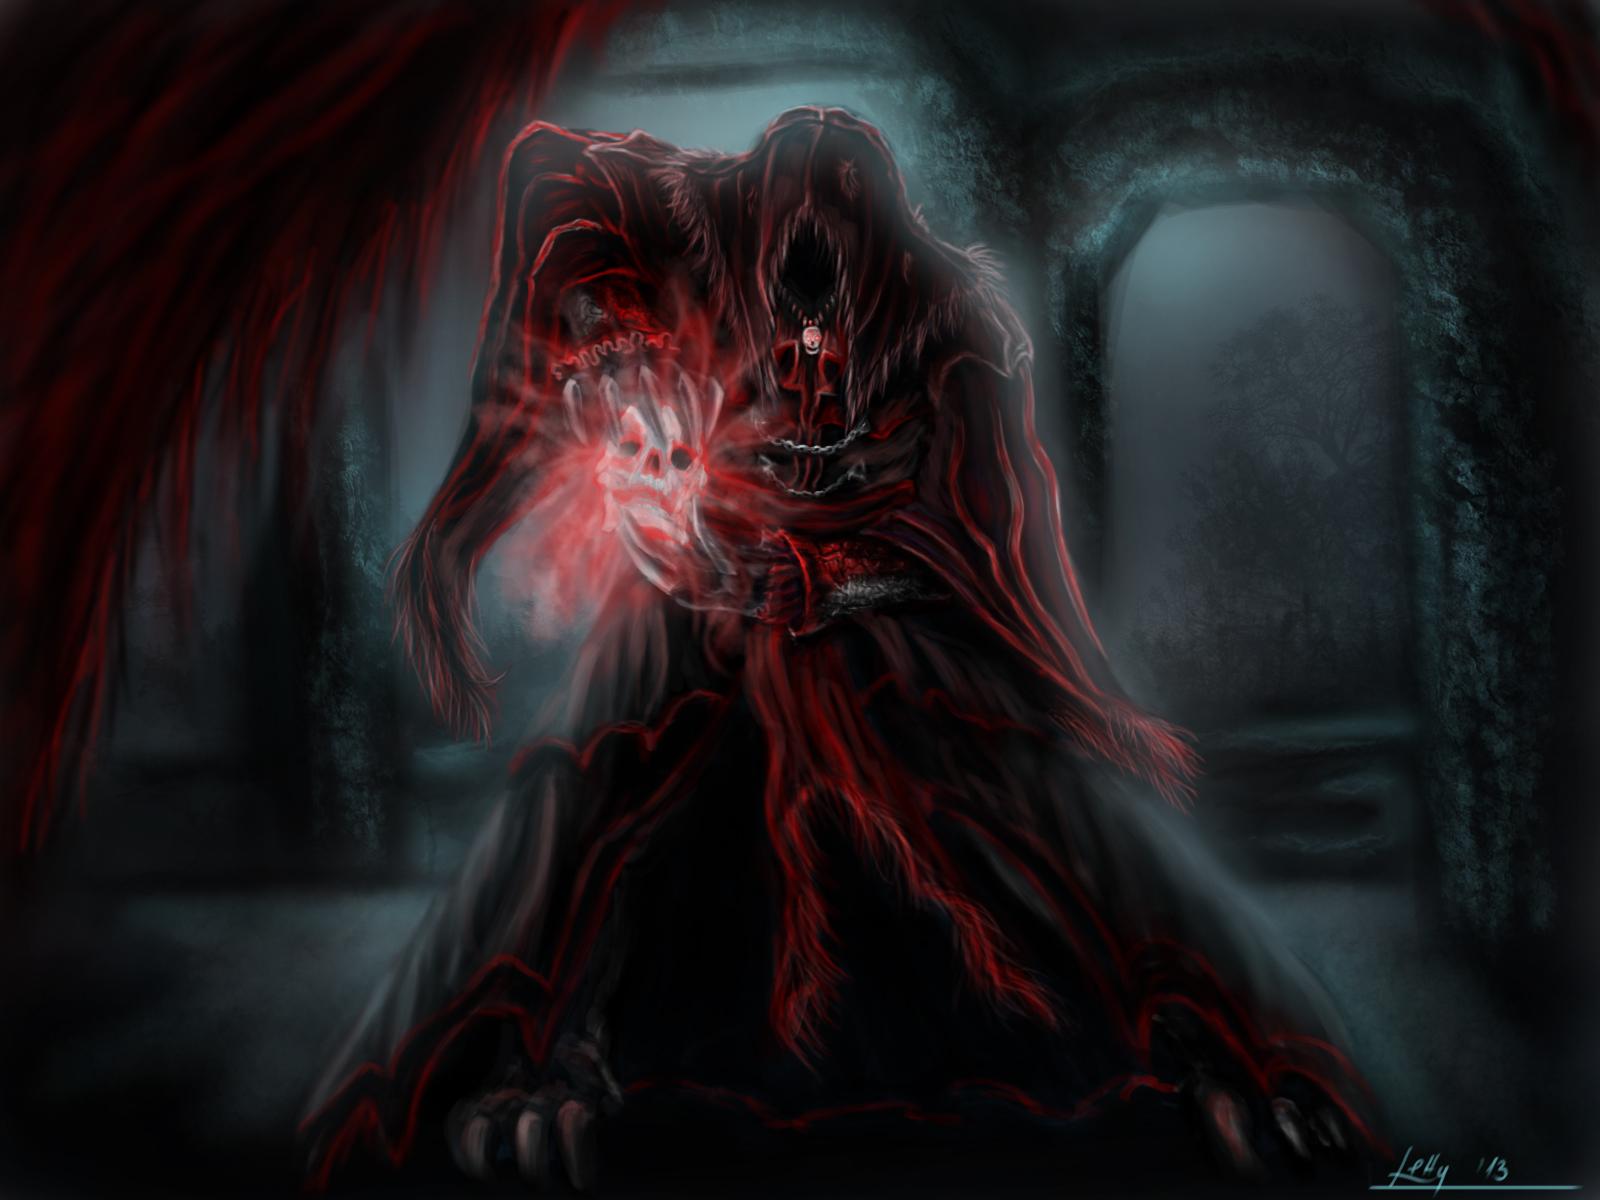 Mortal Kombat Raiden Drawings Black Acolyte by Letti...